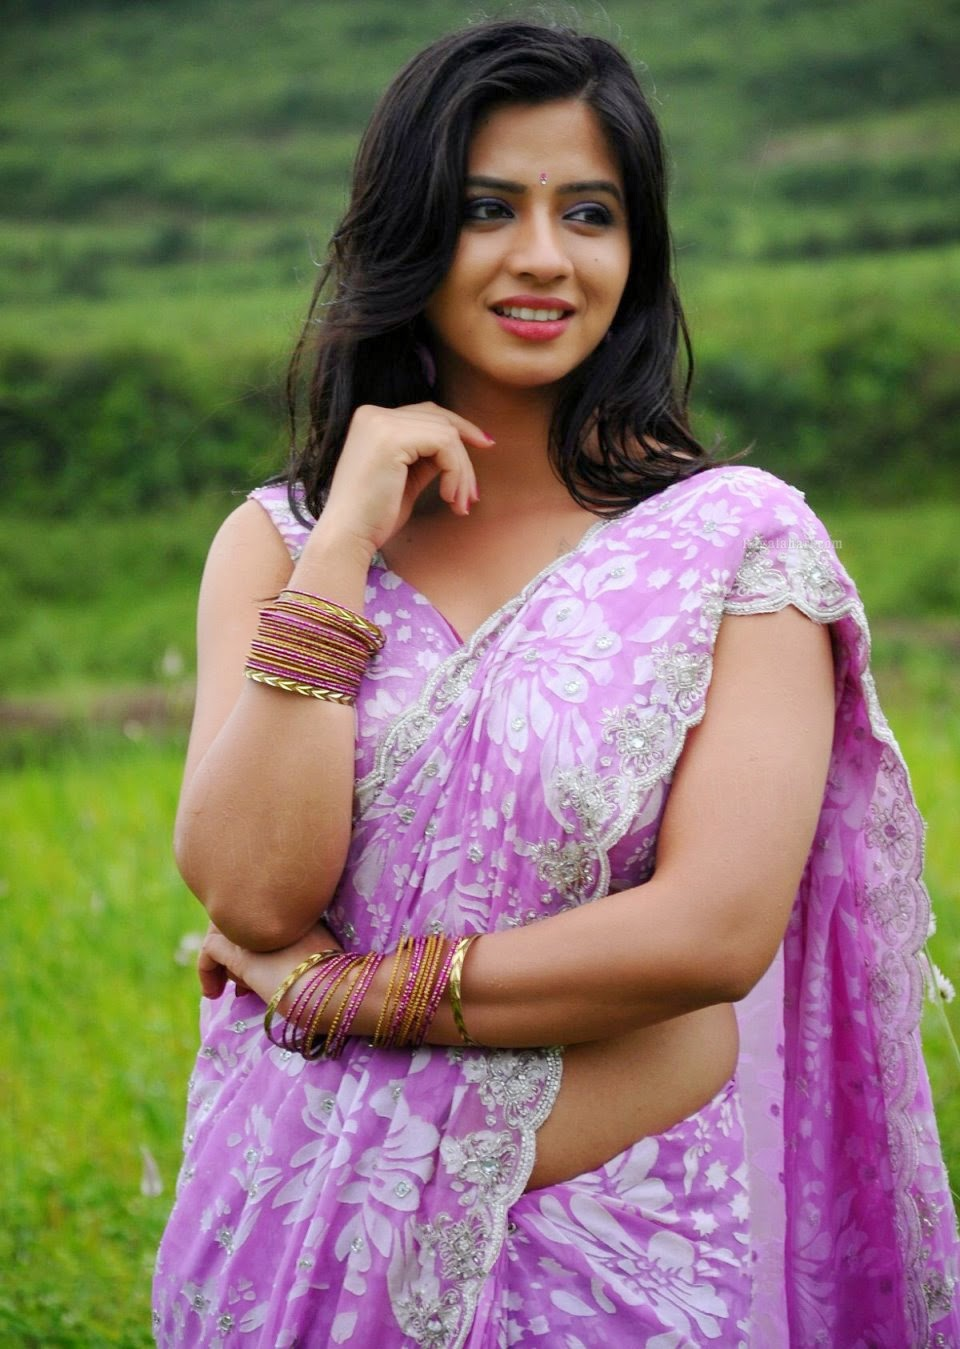 Actress Nisha Shah Hot Navel Show In Saree Stills